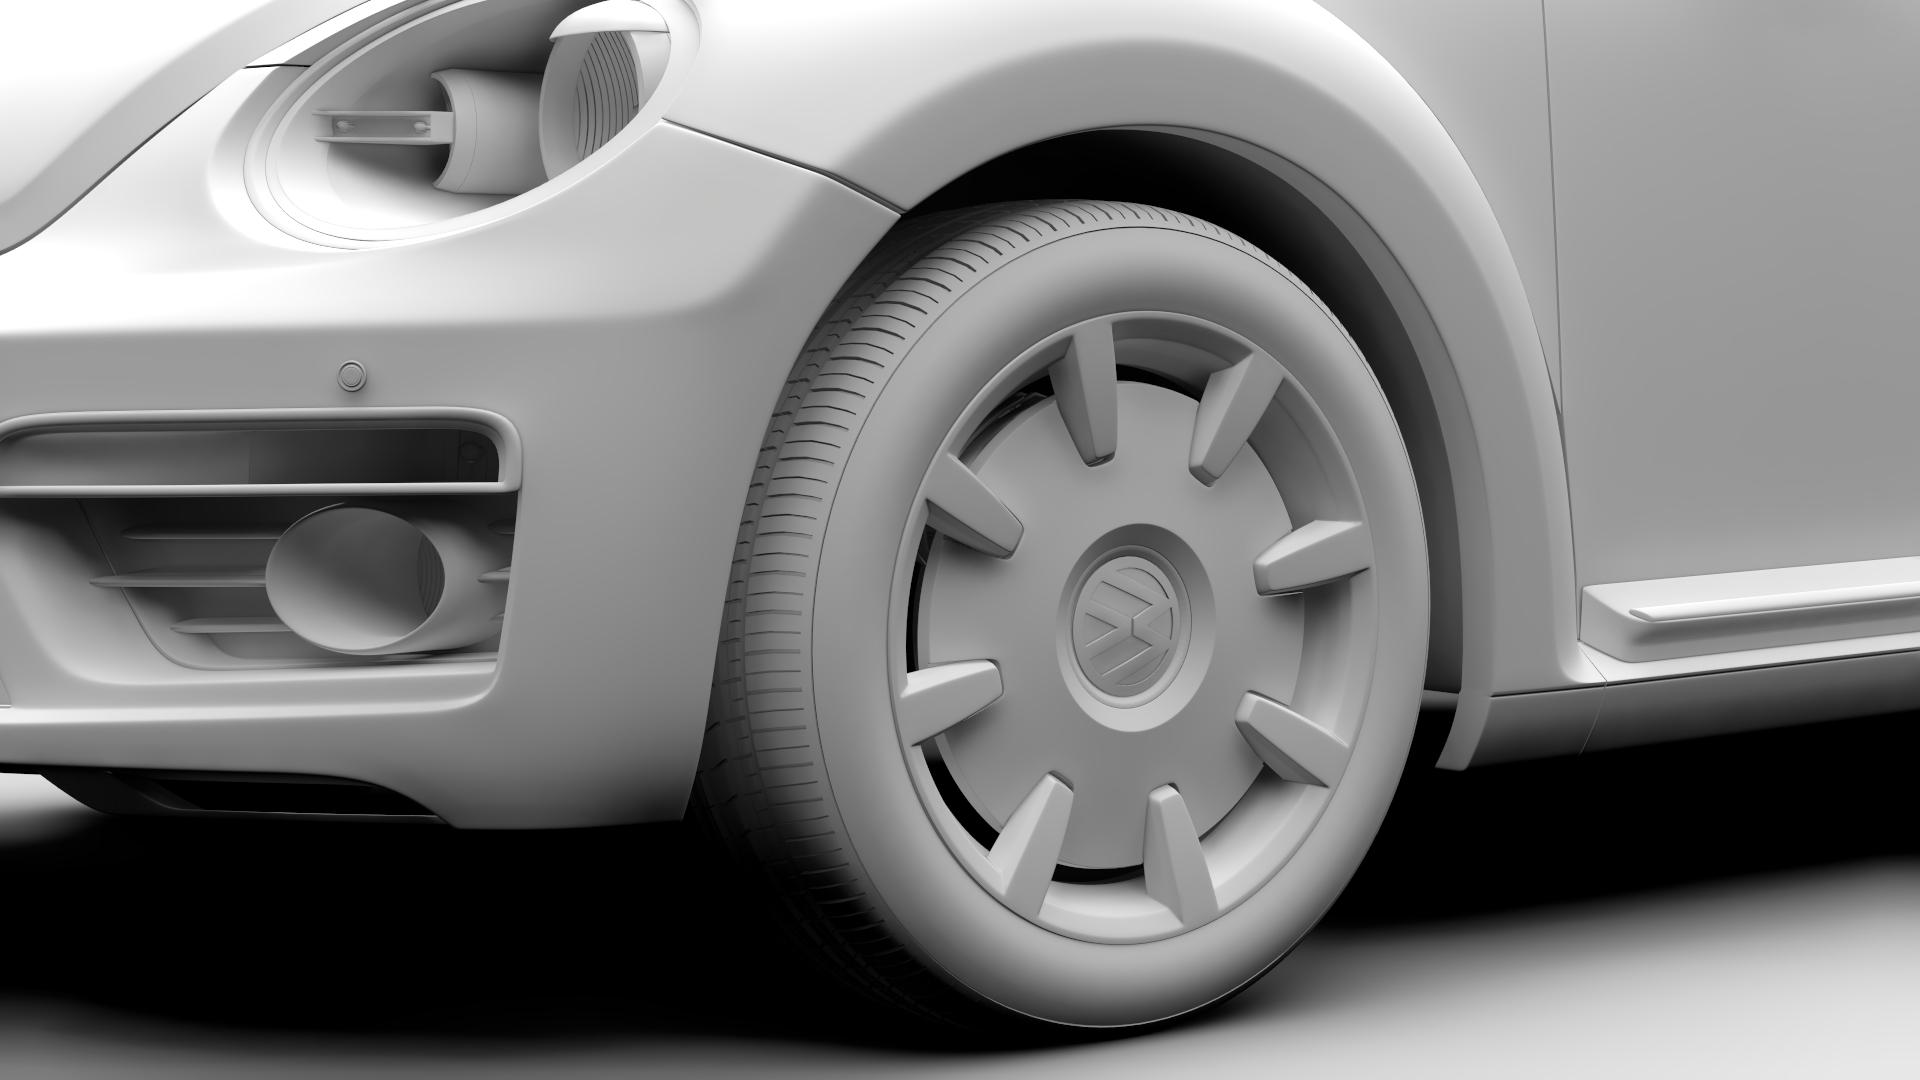 vw beetle turbo 2017 3d model 3ds max fbx c4d lwo ma mb hrc xsi obj 221672